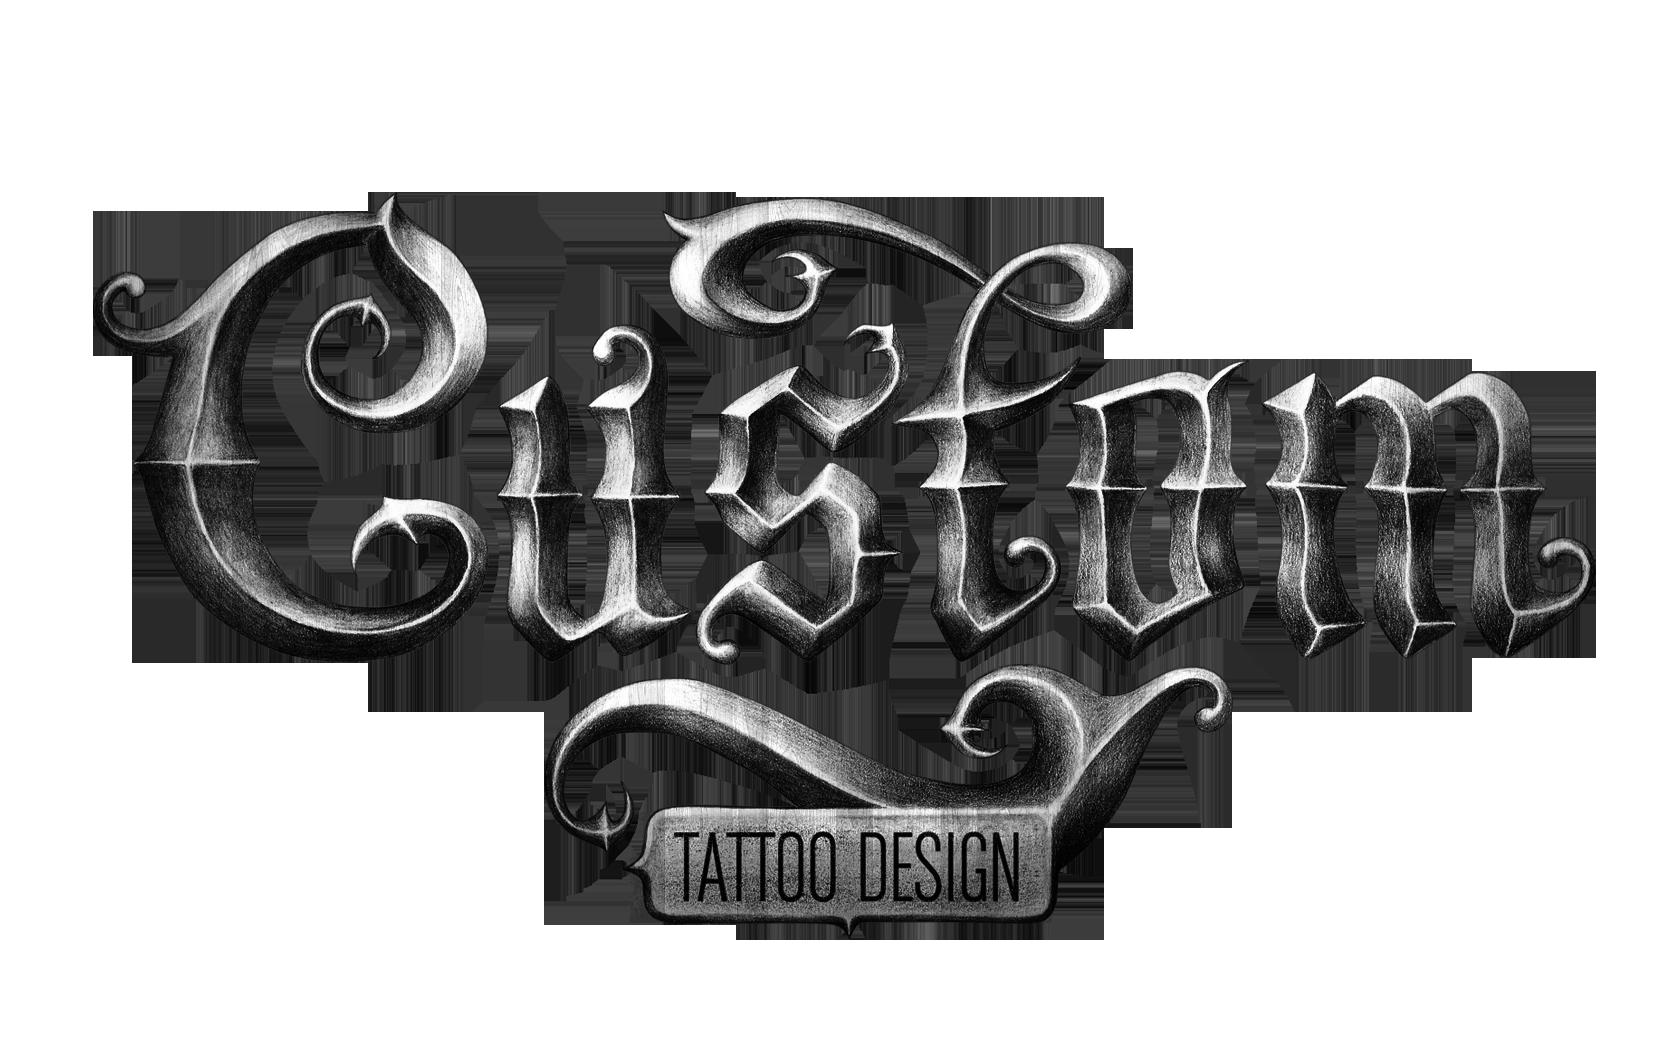 1680x1050 Design Your Dream Tattoo Online Custom Tattoo Design